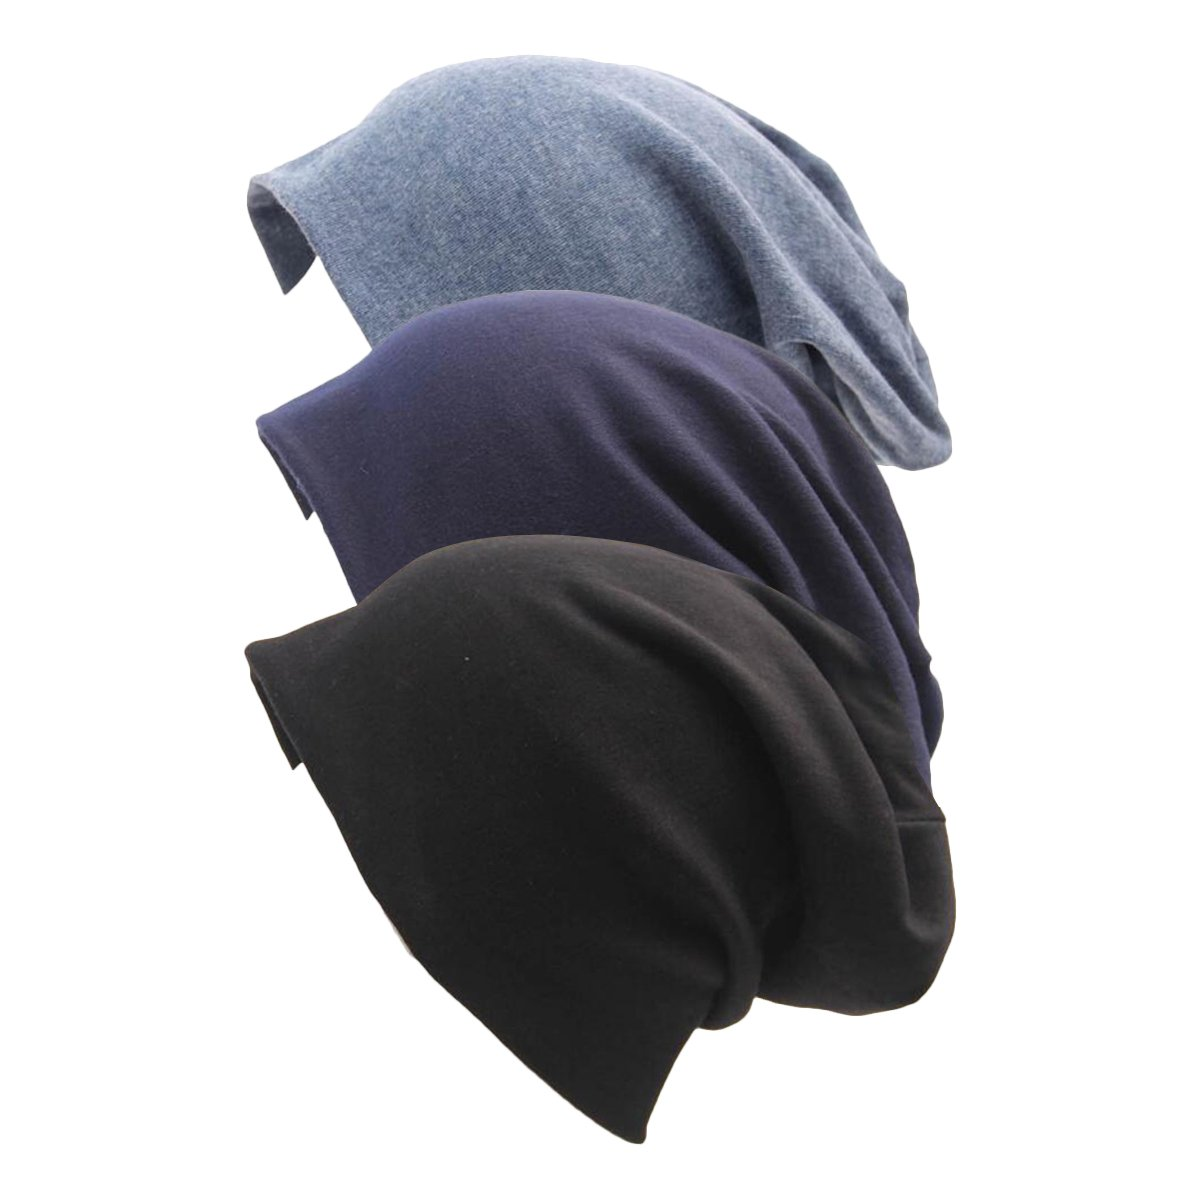 Century Star Women Dots Slouch Beanie Soft Cotton Headwraps Chemo Hat Slouchy Cap (3 Pack) Black&Navy&Denim